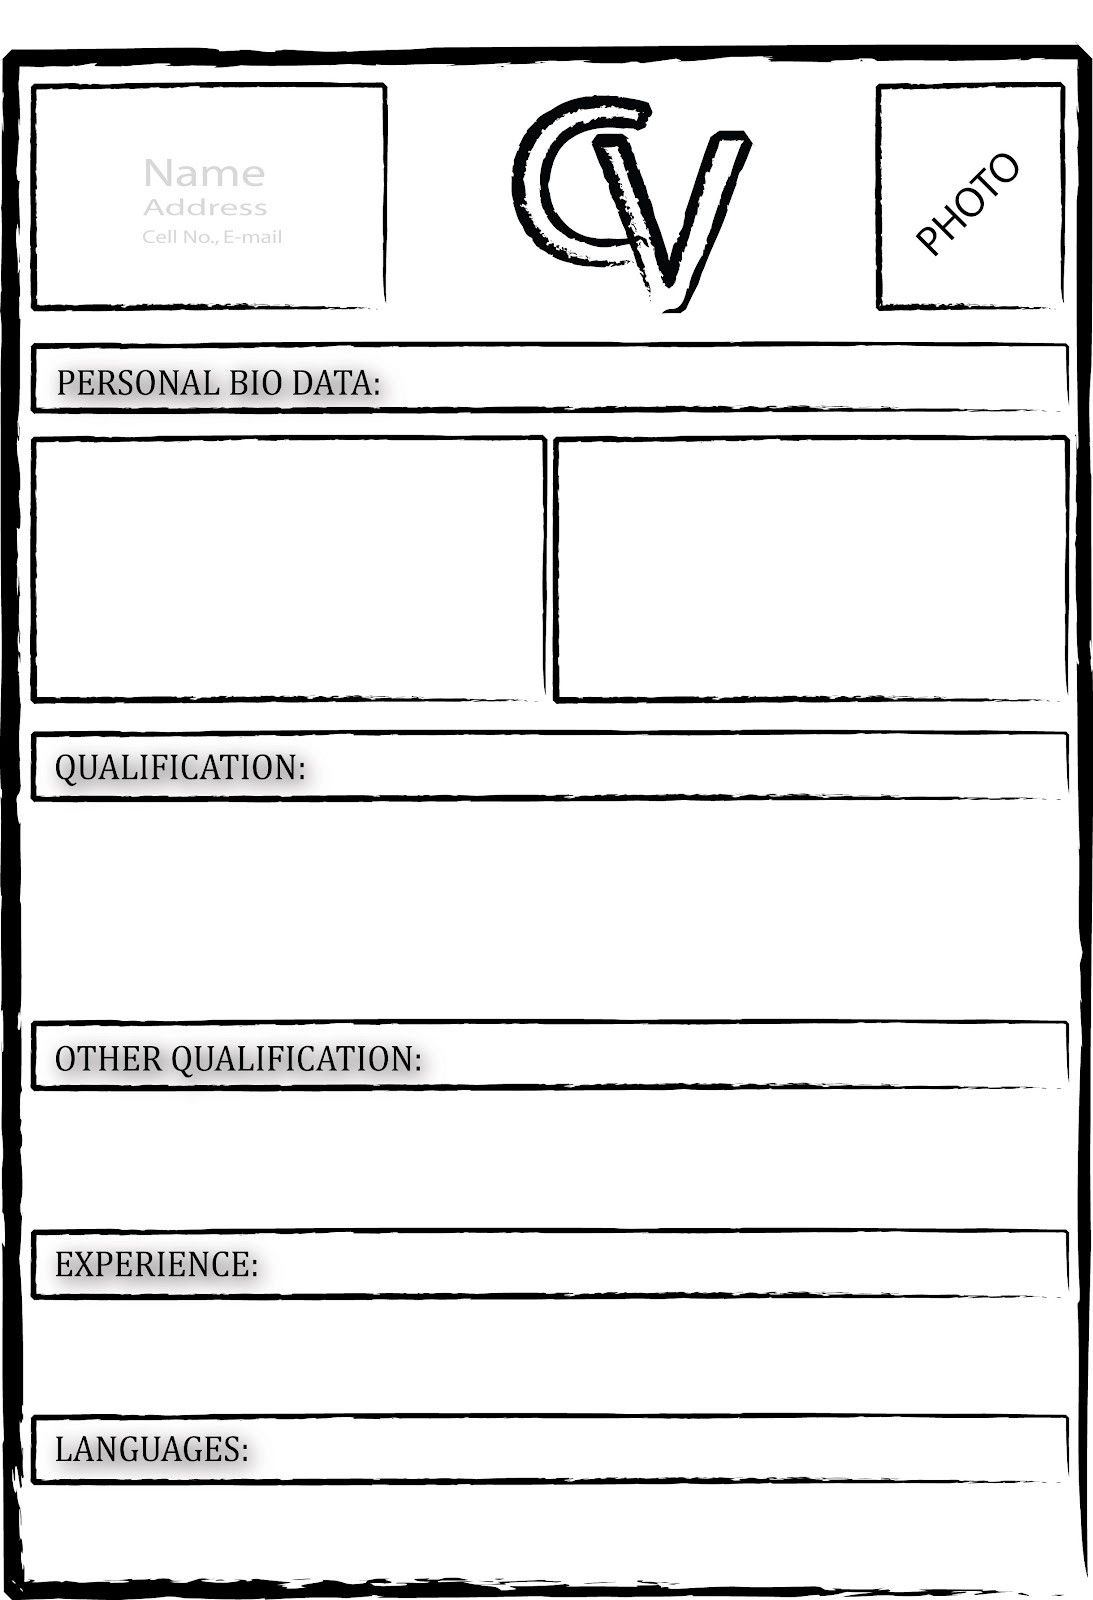 print resume template resume psd template 11 free resume cff979f82ea20505afa48f24304eb747 print resume templatehtml